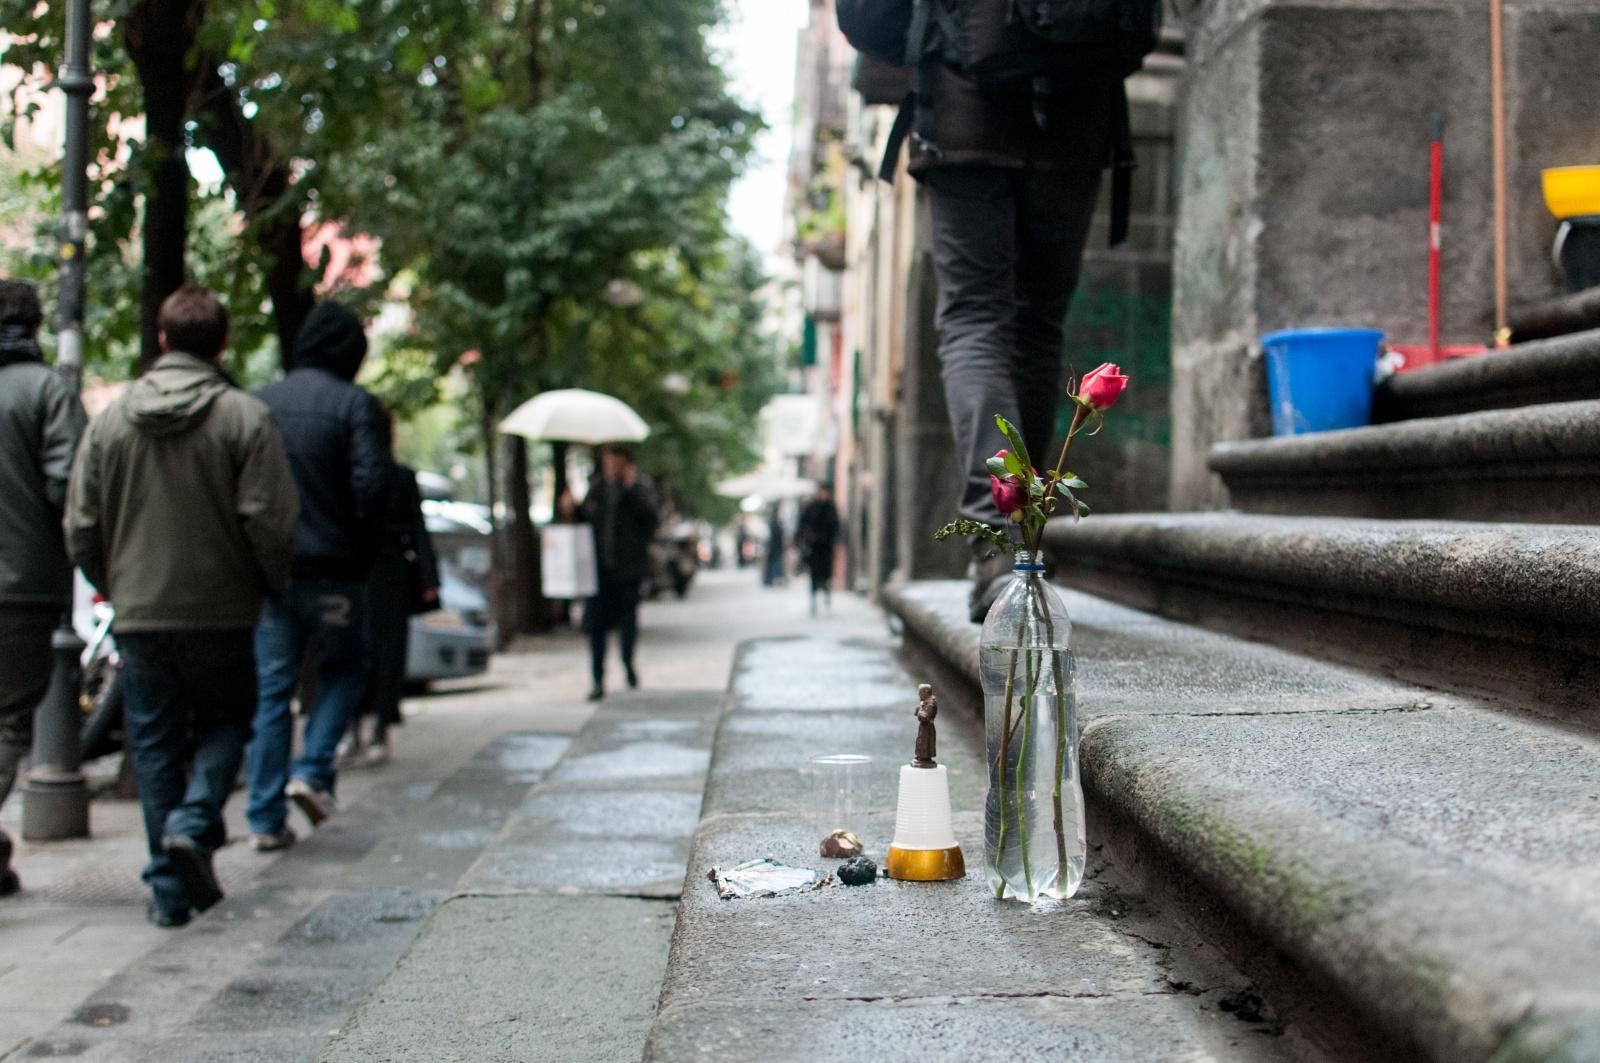 Artistrash | Napoli - 22/01/2014